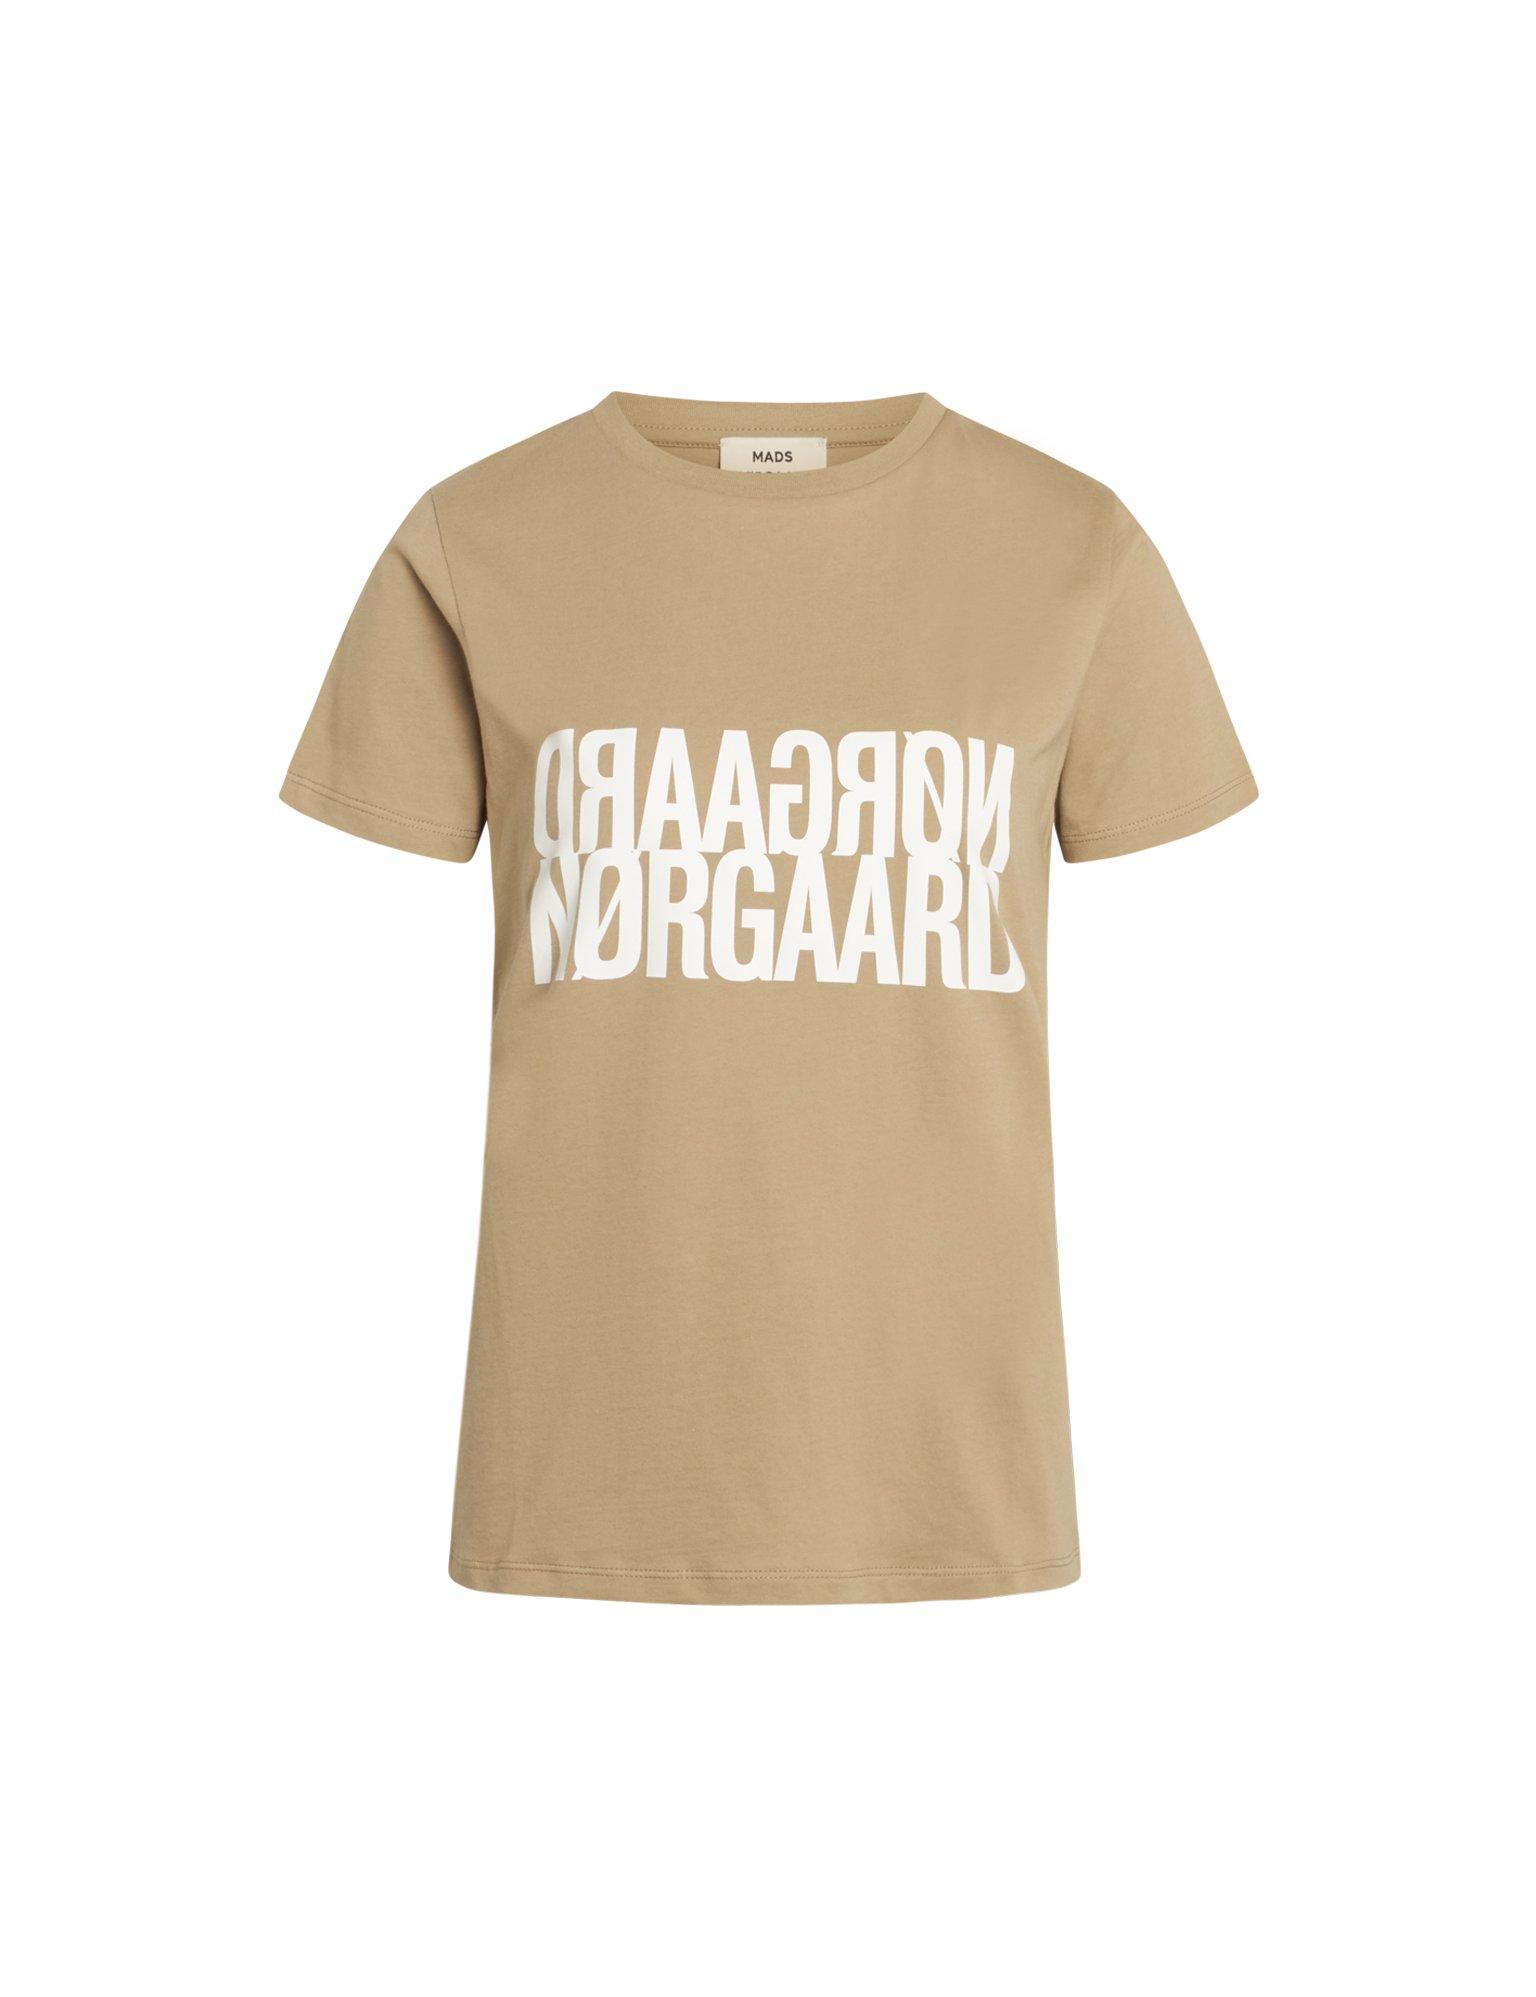 Mads Nørgaard Single Organic Trenda P t-shirt